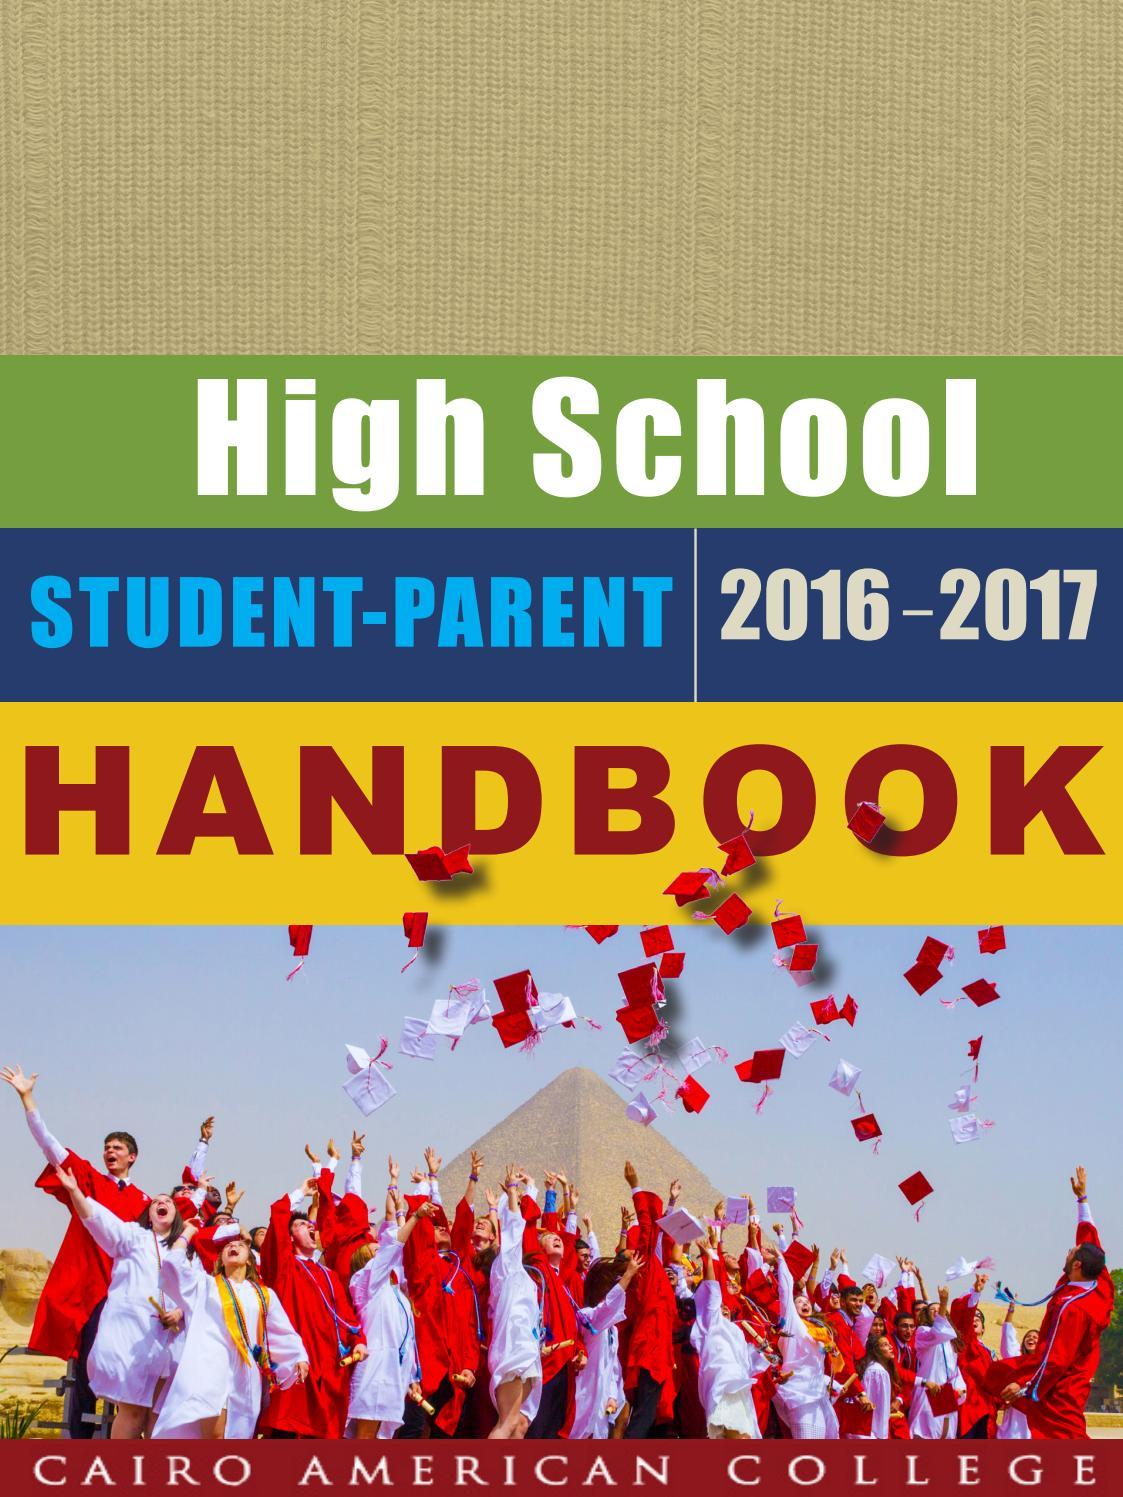 Hs parent student 2016 2017 handbook by mim1984 issuu fandeluxe Choice Image